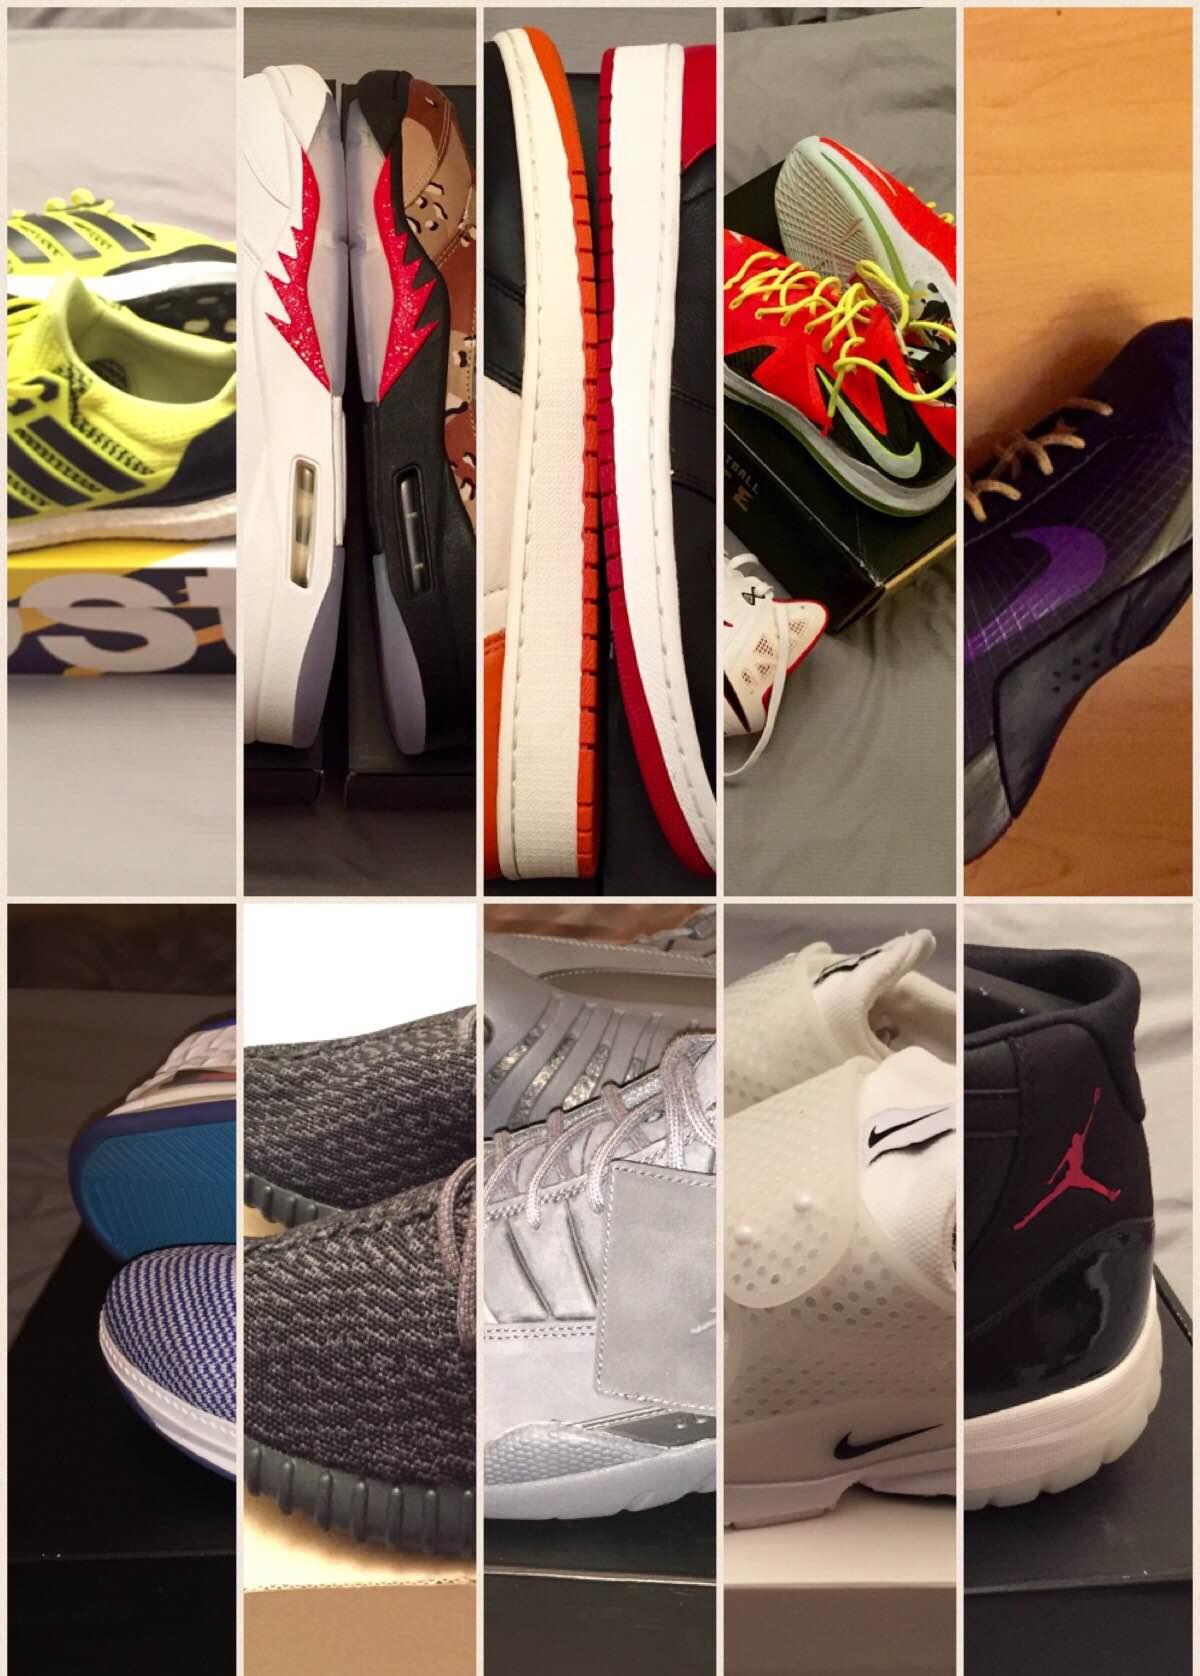 518e490aa adidas   Basketball   Brandblack   Jordan Brand   Kicks Off Court    Lifestyle   Nike   Retro Lifestyle   Runners ...